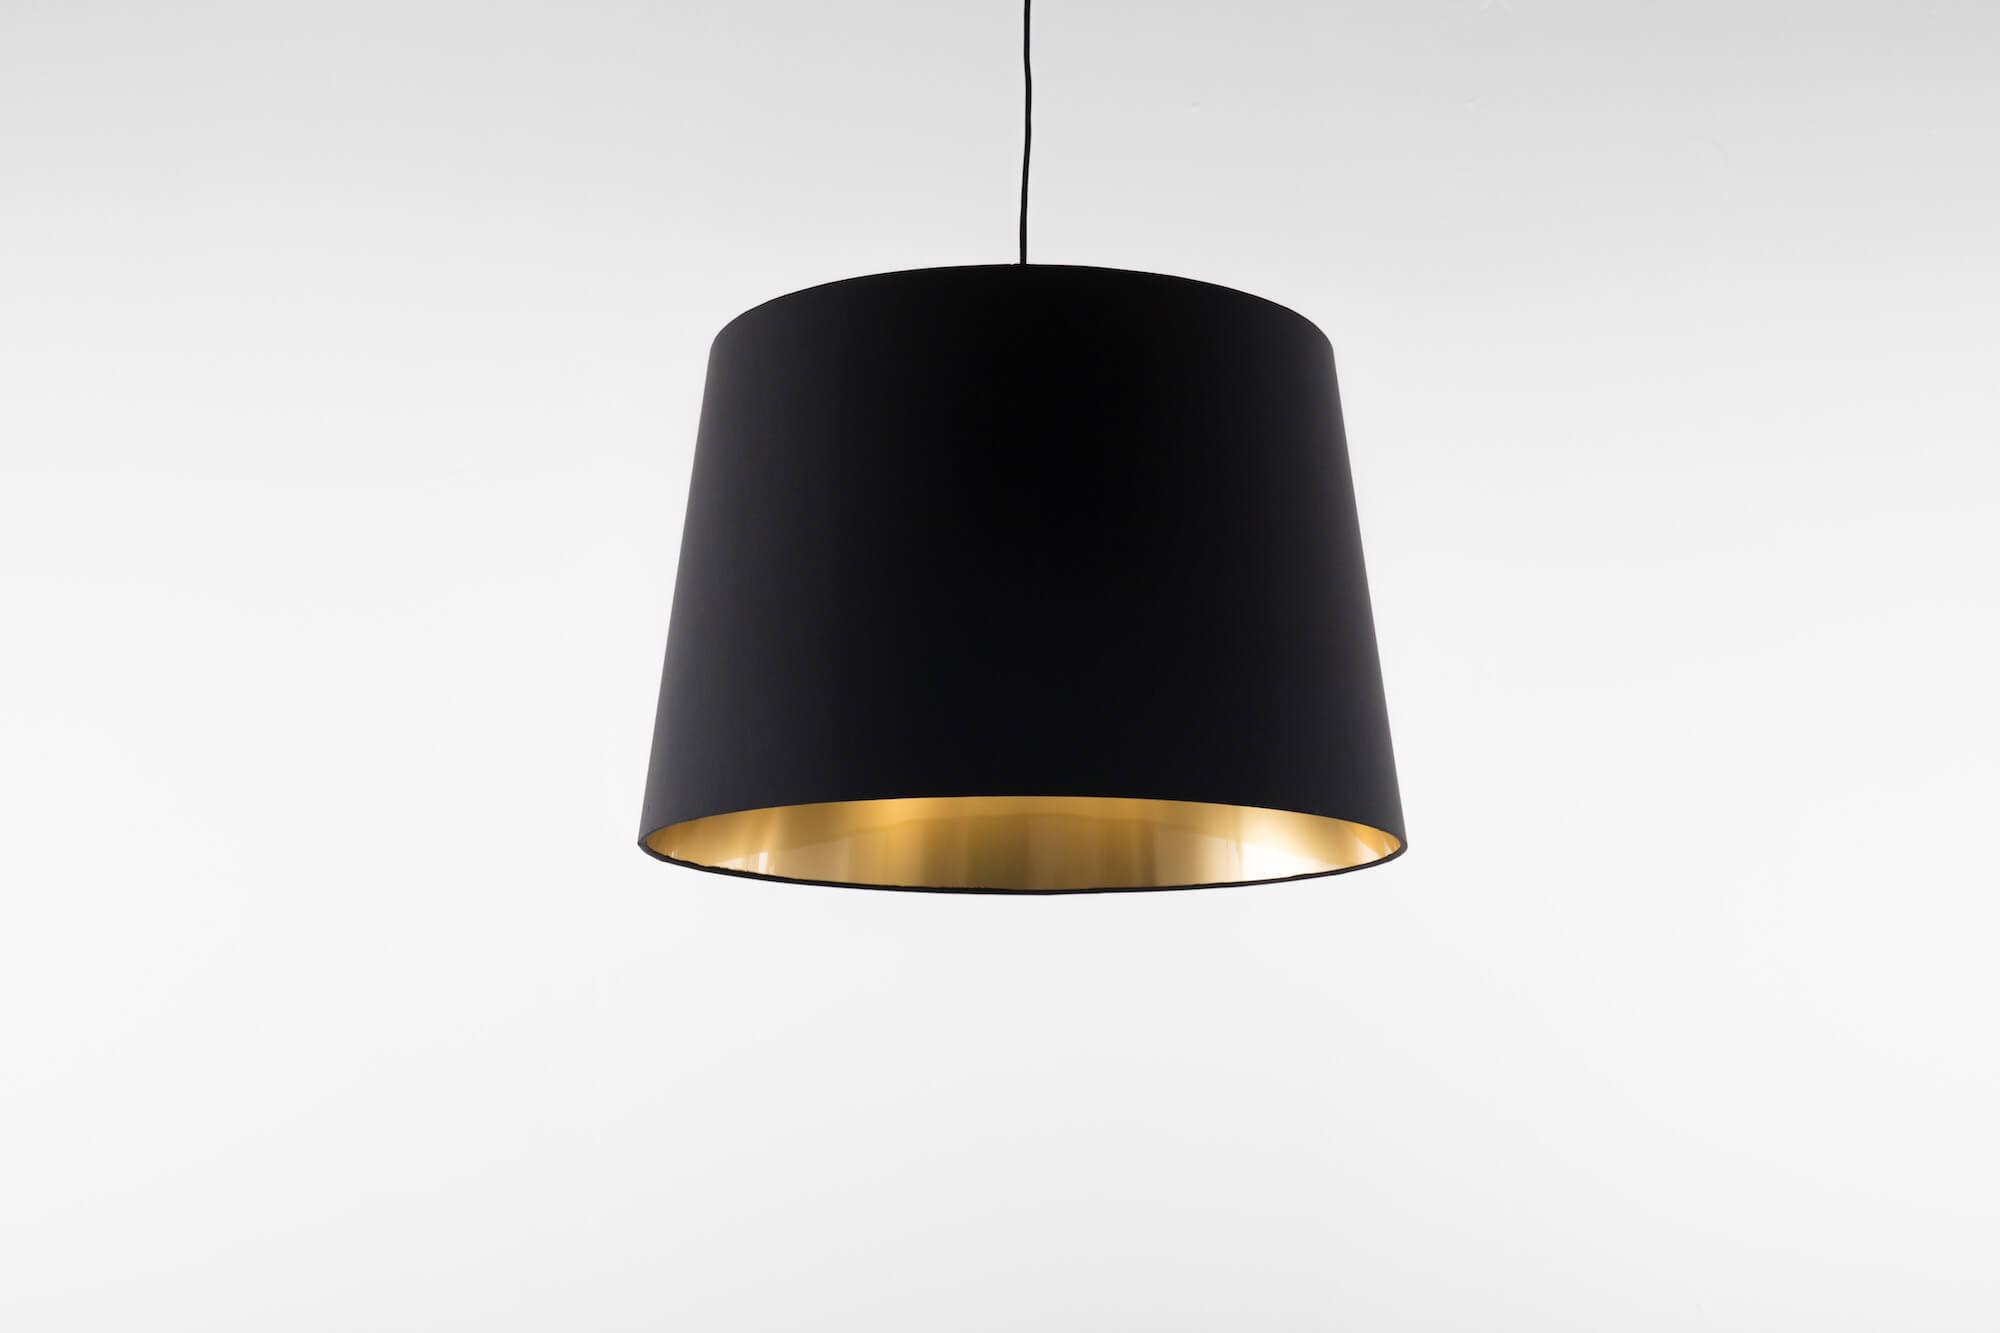 unsere produkte nemec lampenschirme. Black Bedroom Furniture Sets. Home Design Ideas